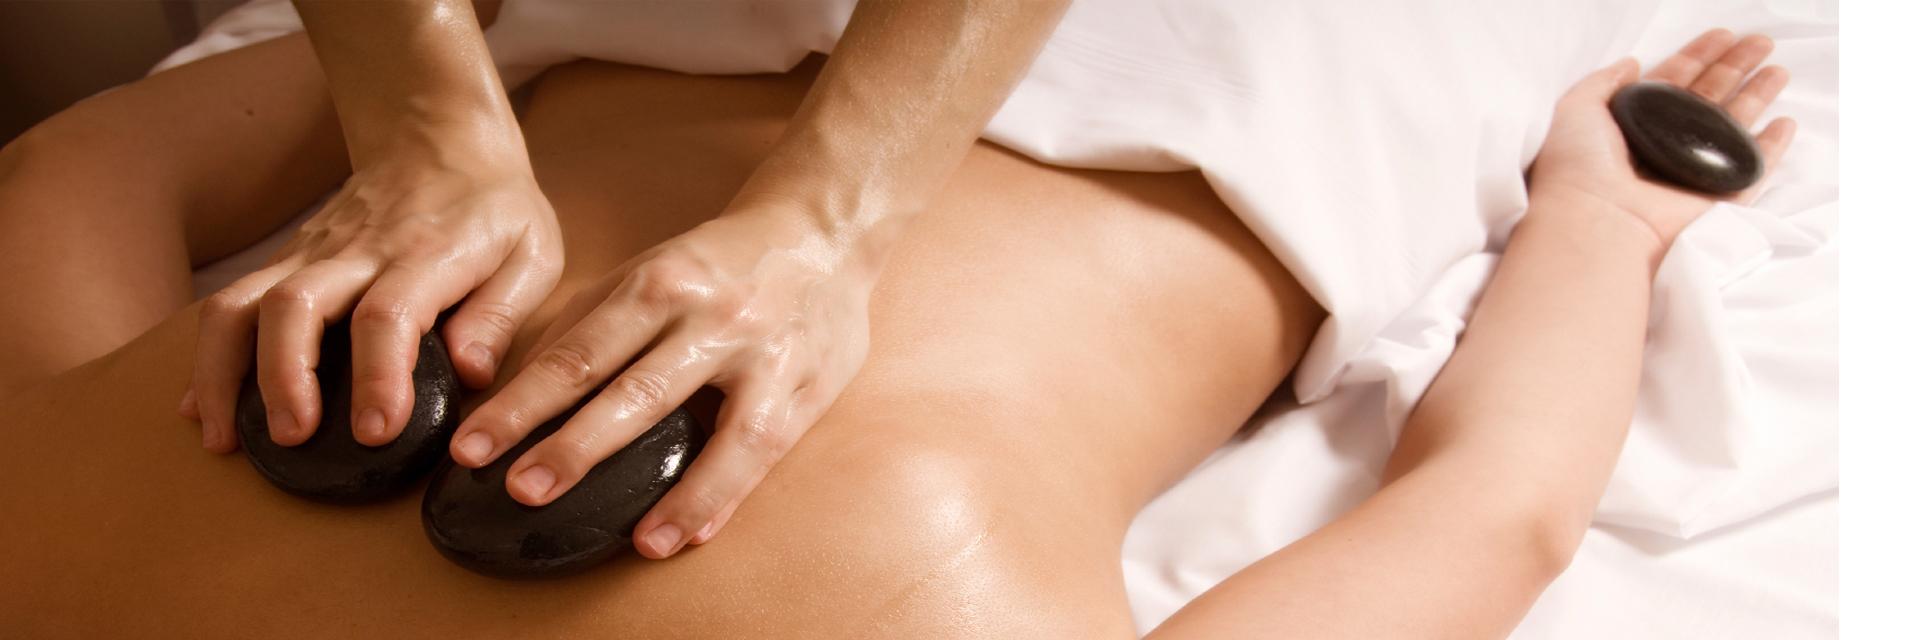 varm massage outcall i stockholm